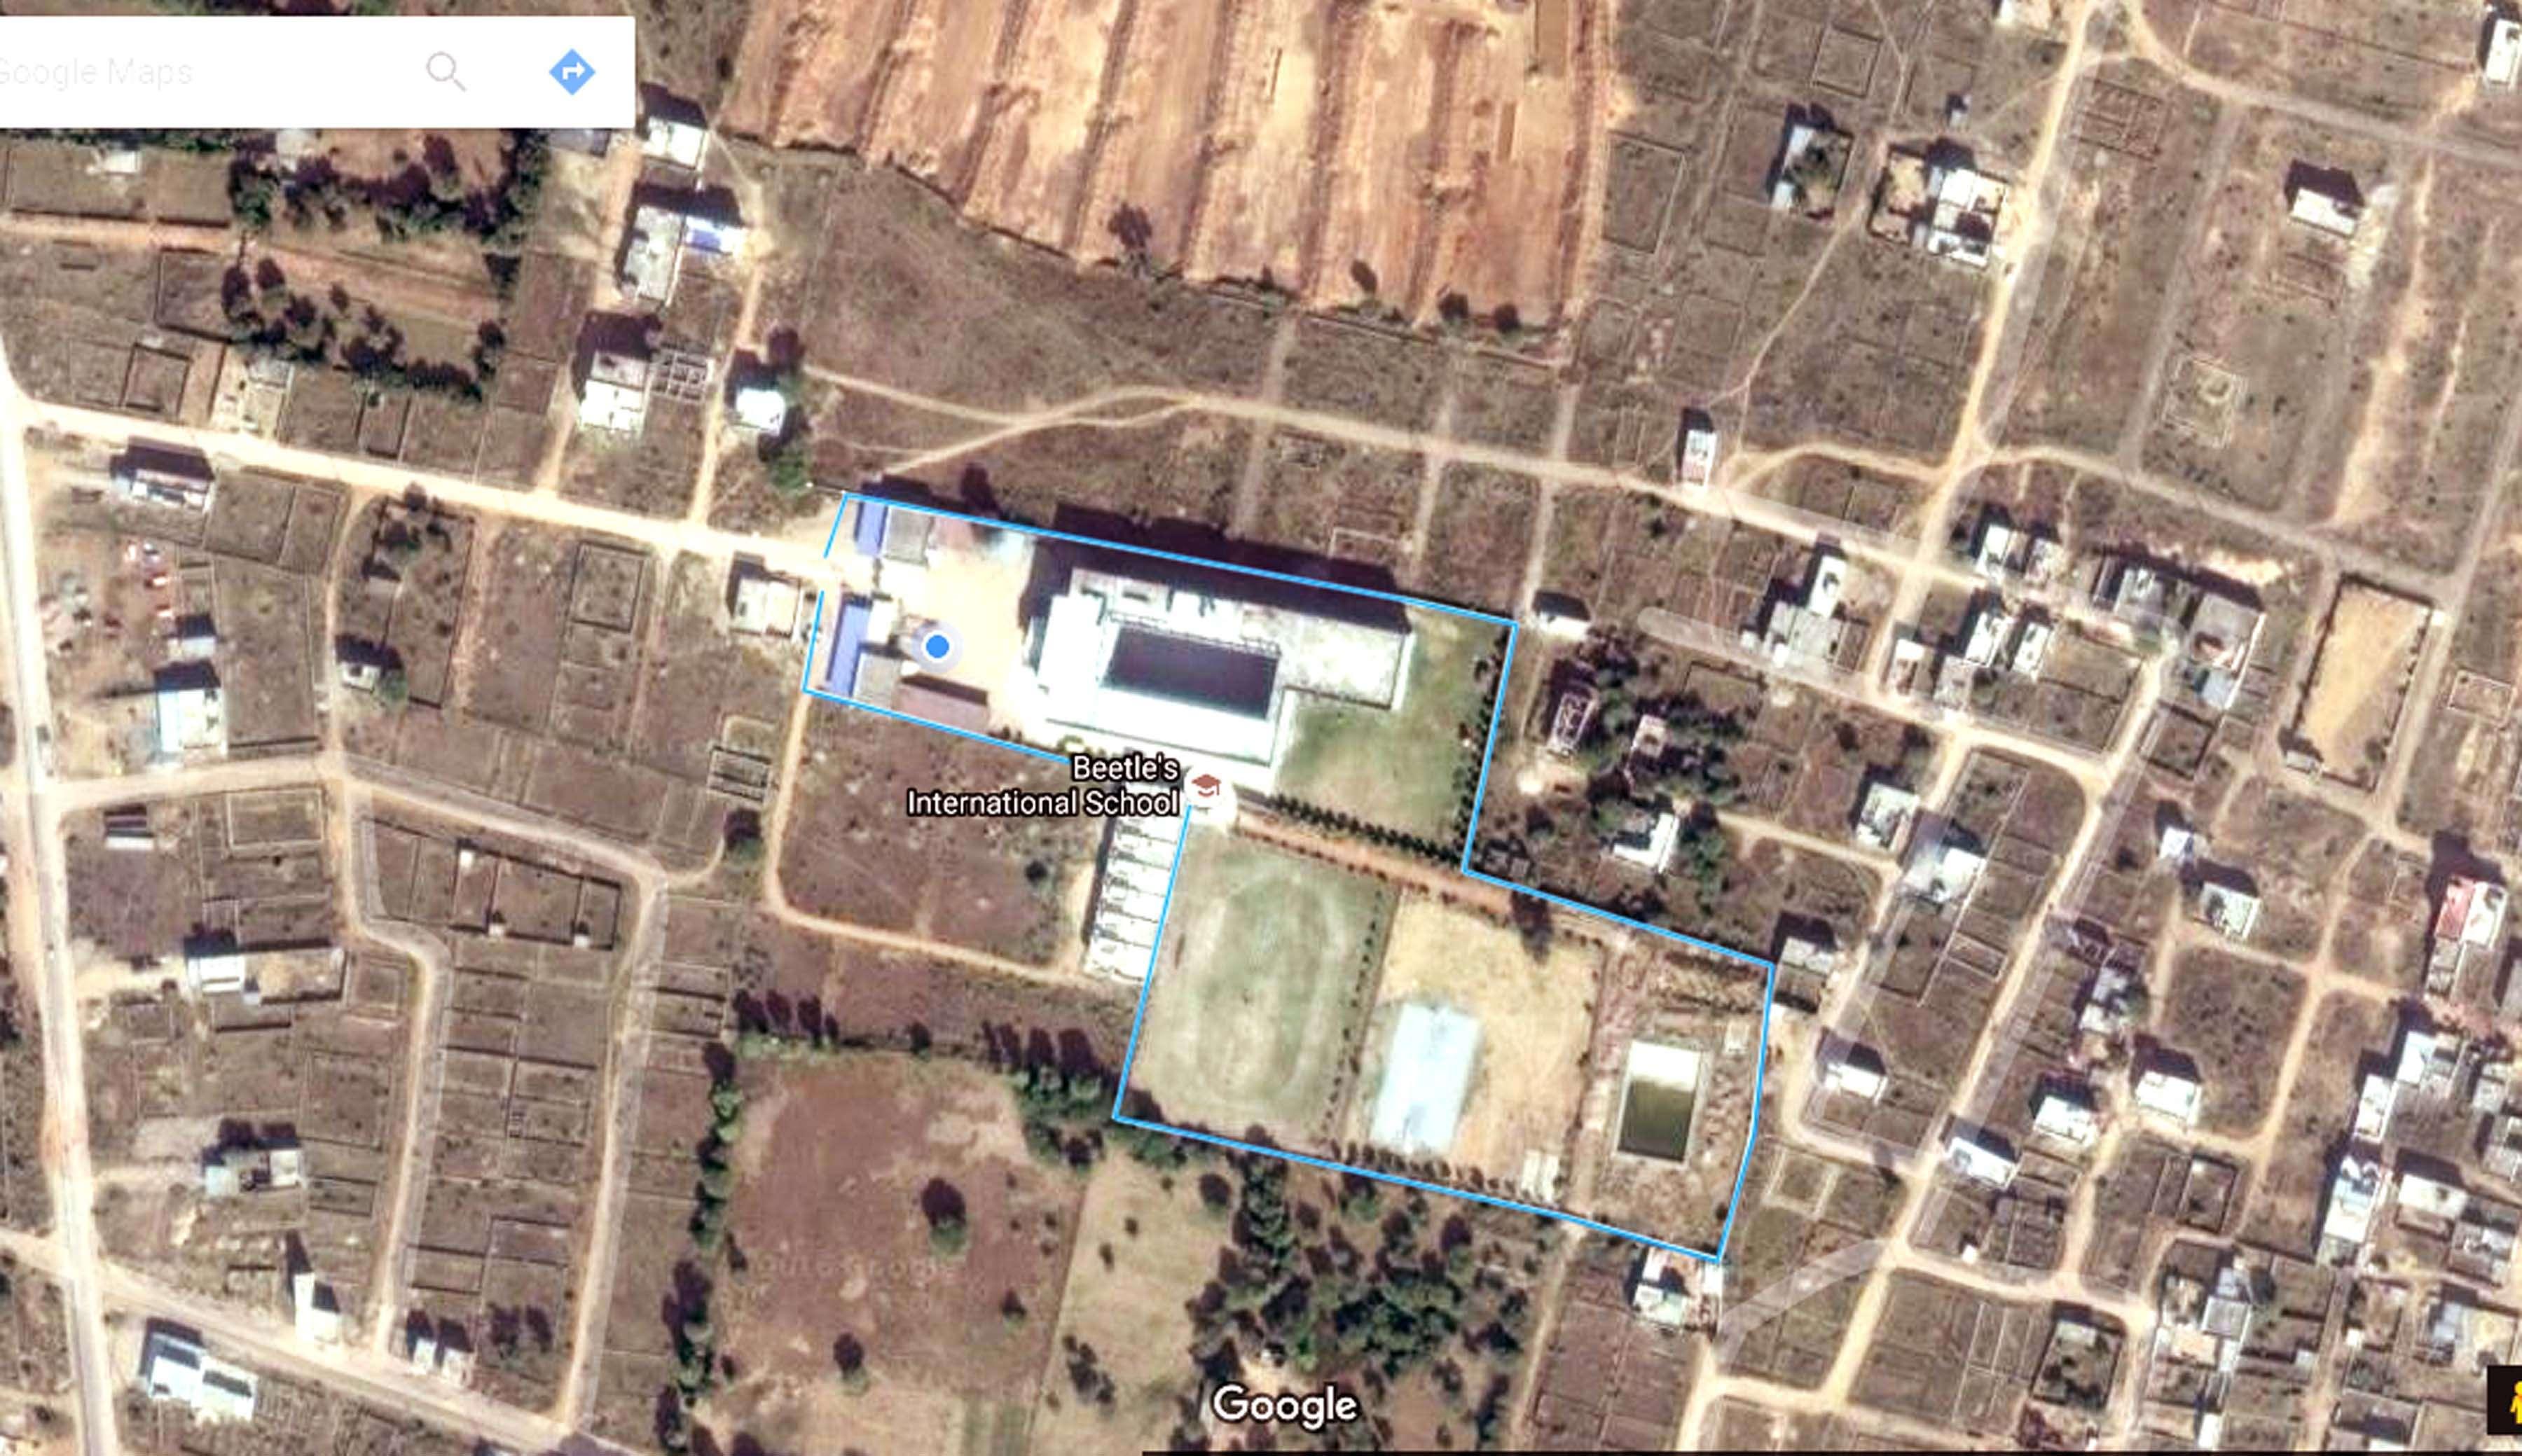 BEETLE S INTERNATIONAL SCHOOL NEAR HEAVENS GARDEN SUMEL ROAD AGRA ROAD JAIPUR 1730521